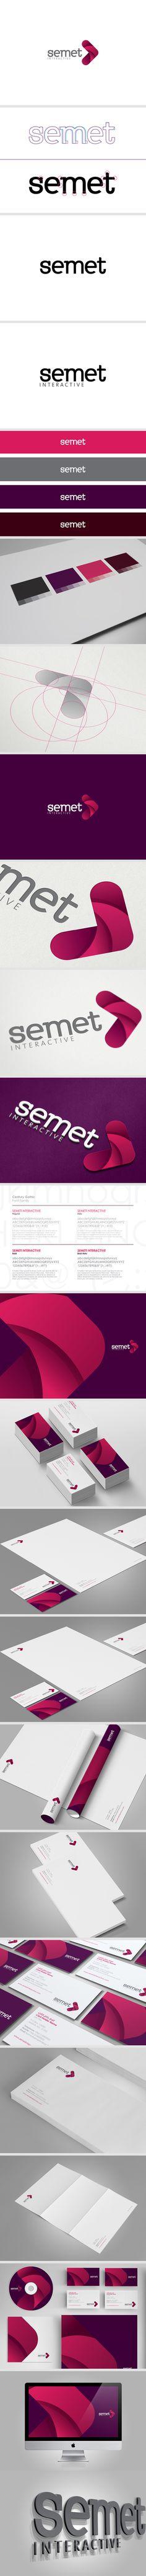 Semet Visual Identity #design #corporate #identity #branding #visual